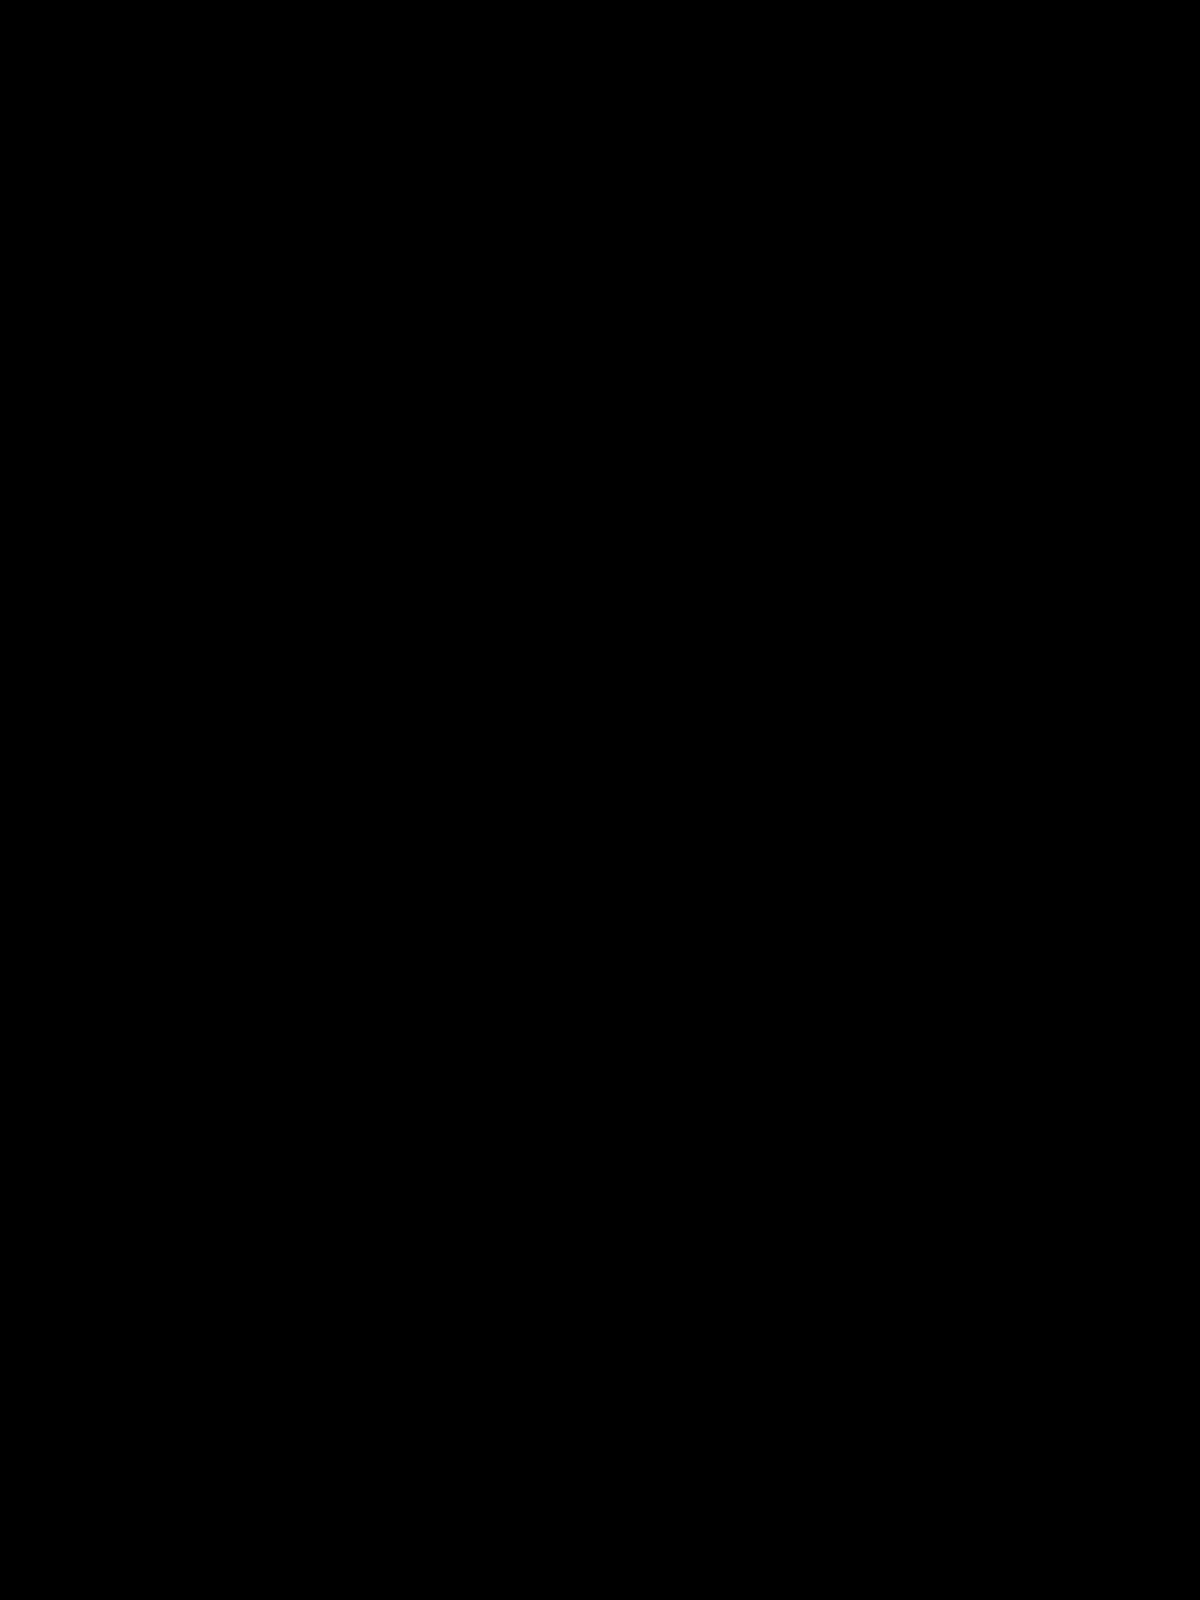 Vertikal-Stoßmaschine Balzat EUV 32 / 300 NC – 18-11-006